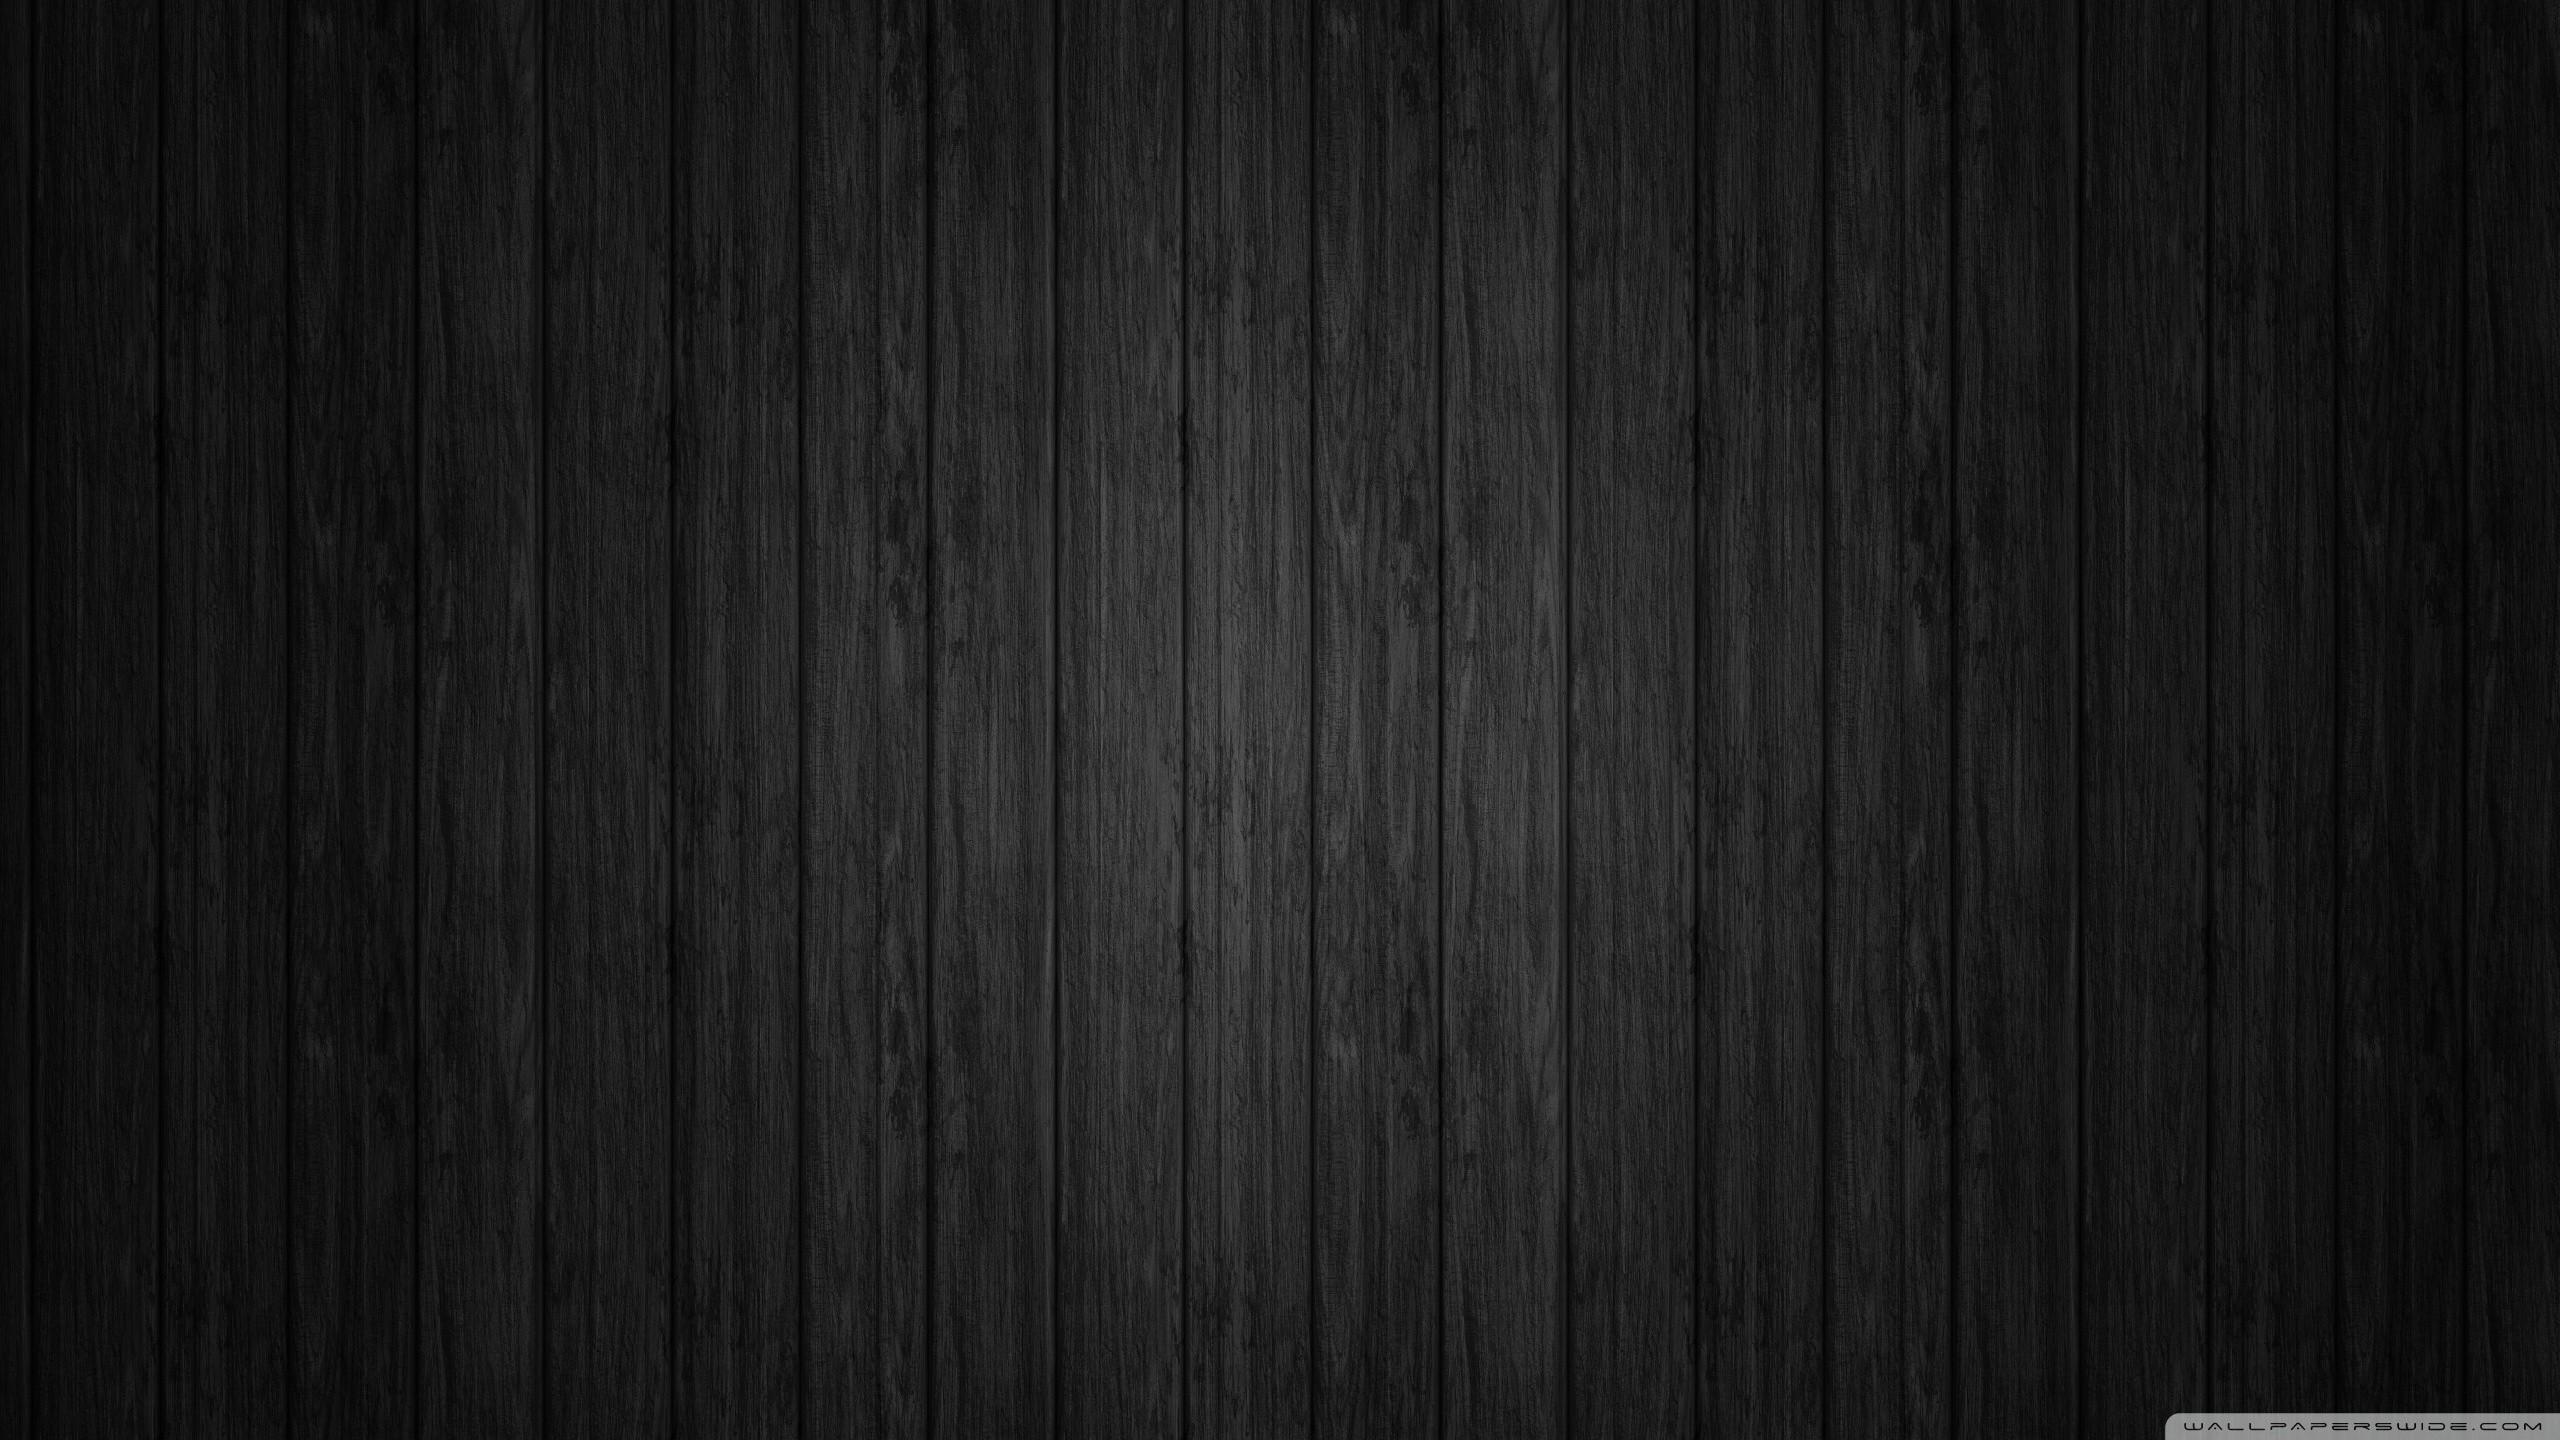 Wallpapers Full HD wallpaper search